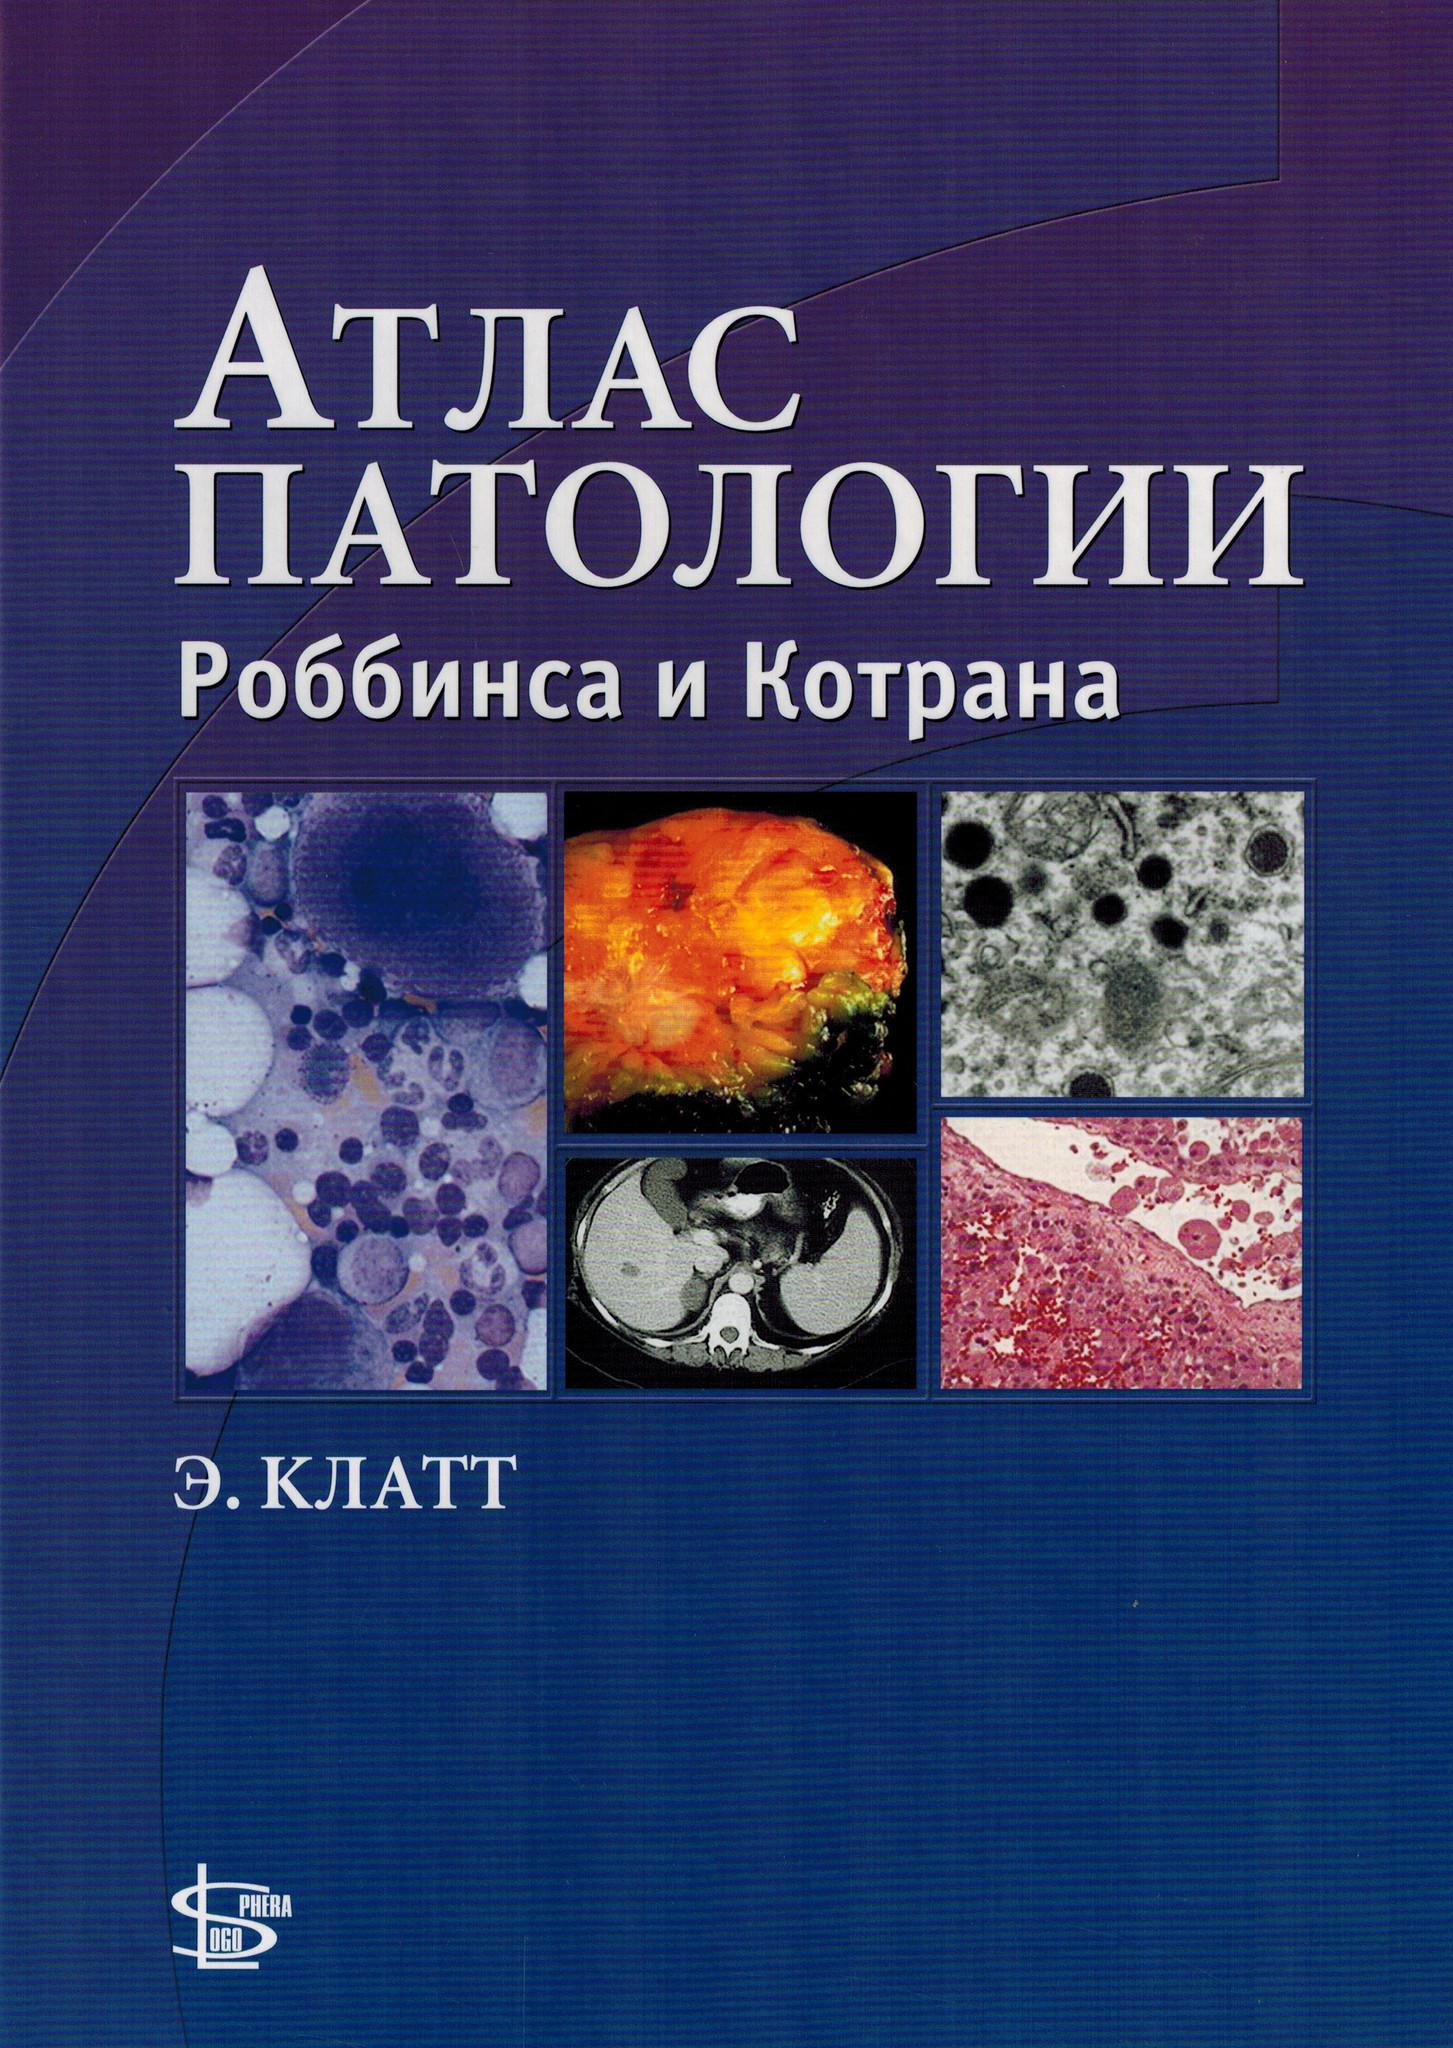 Каталог Атлас патологии Роббинса и Котрана aprk.jpg